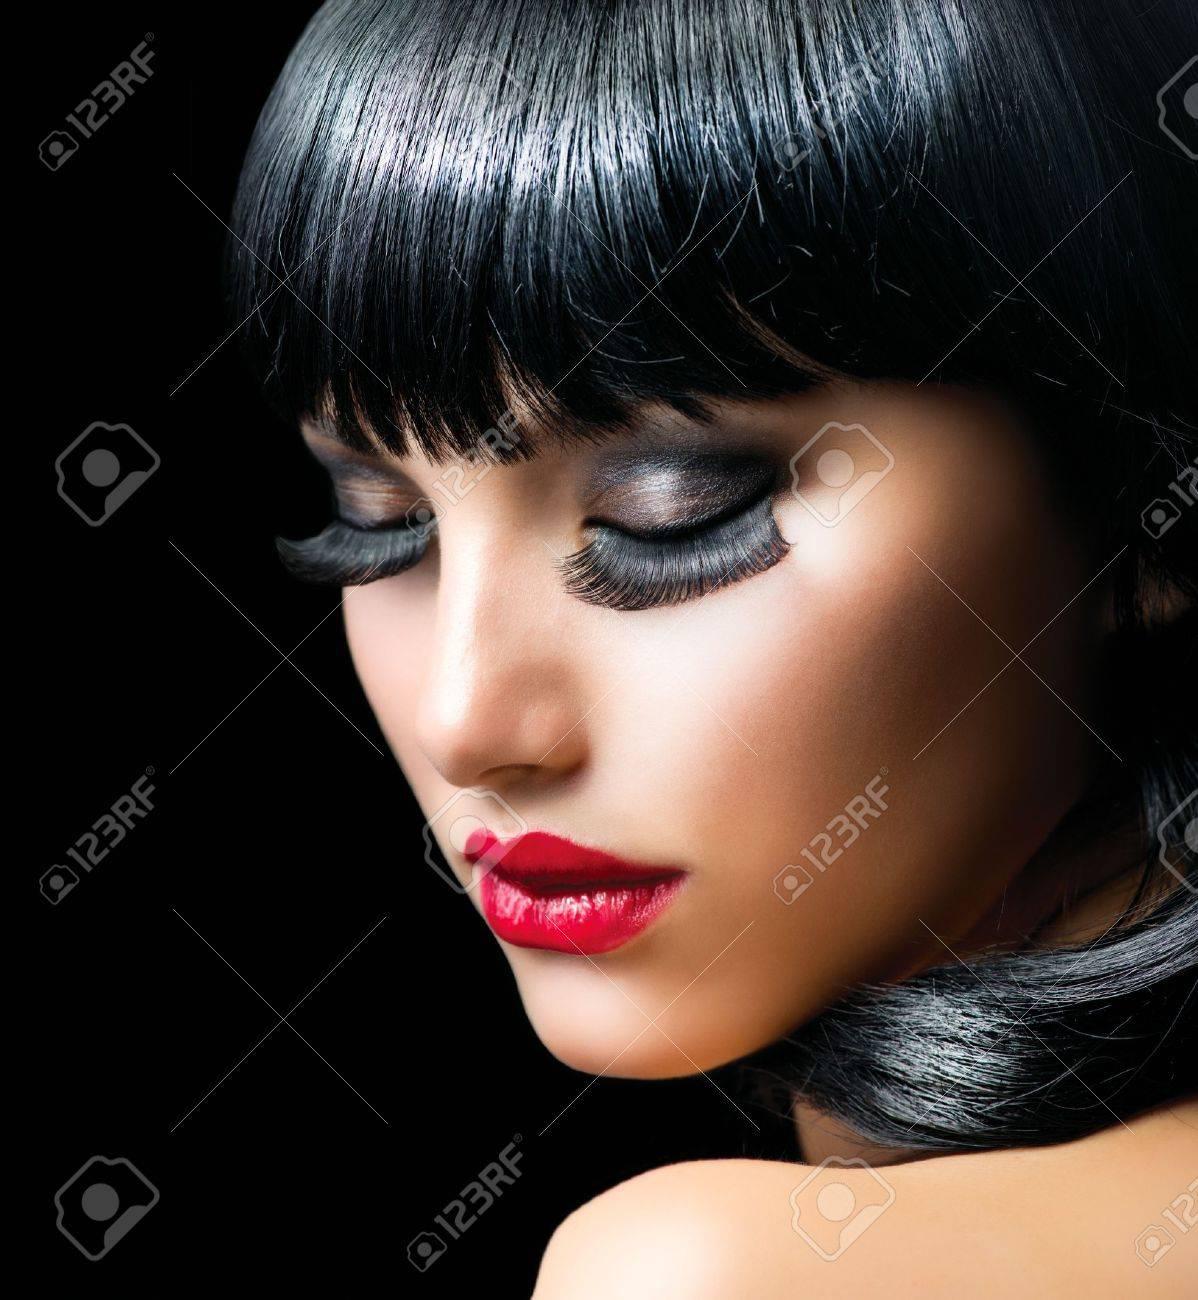 Fashion Brunette Girl Portrait close-up Stock Photo - 17602620